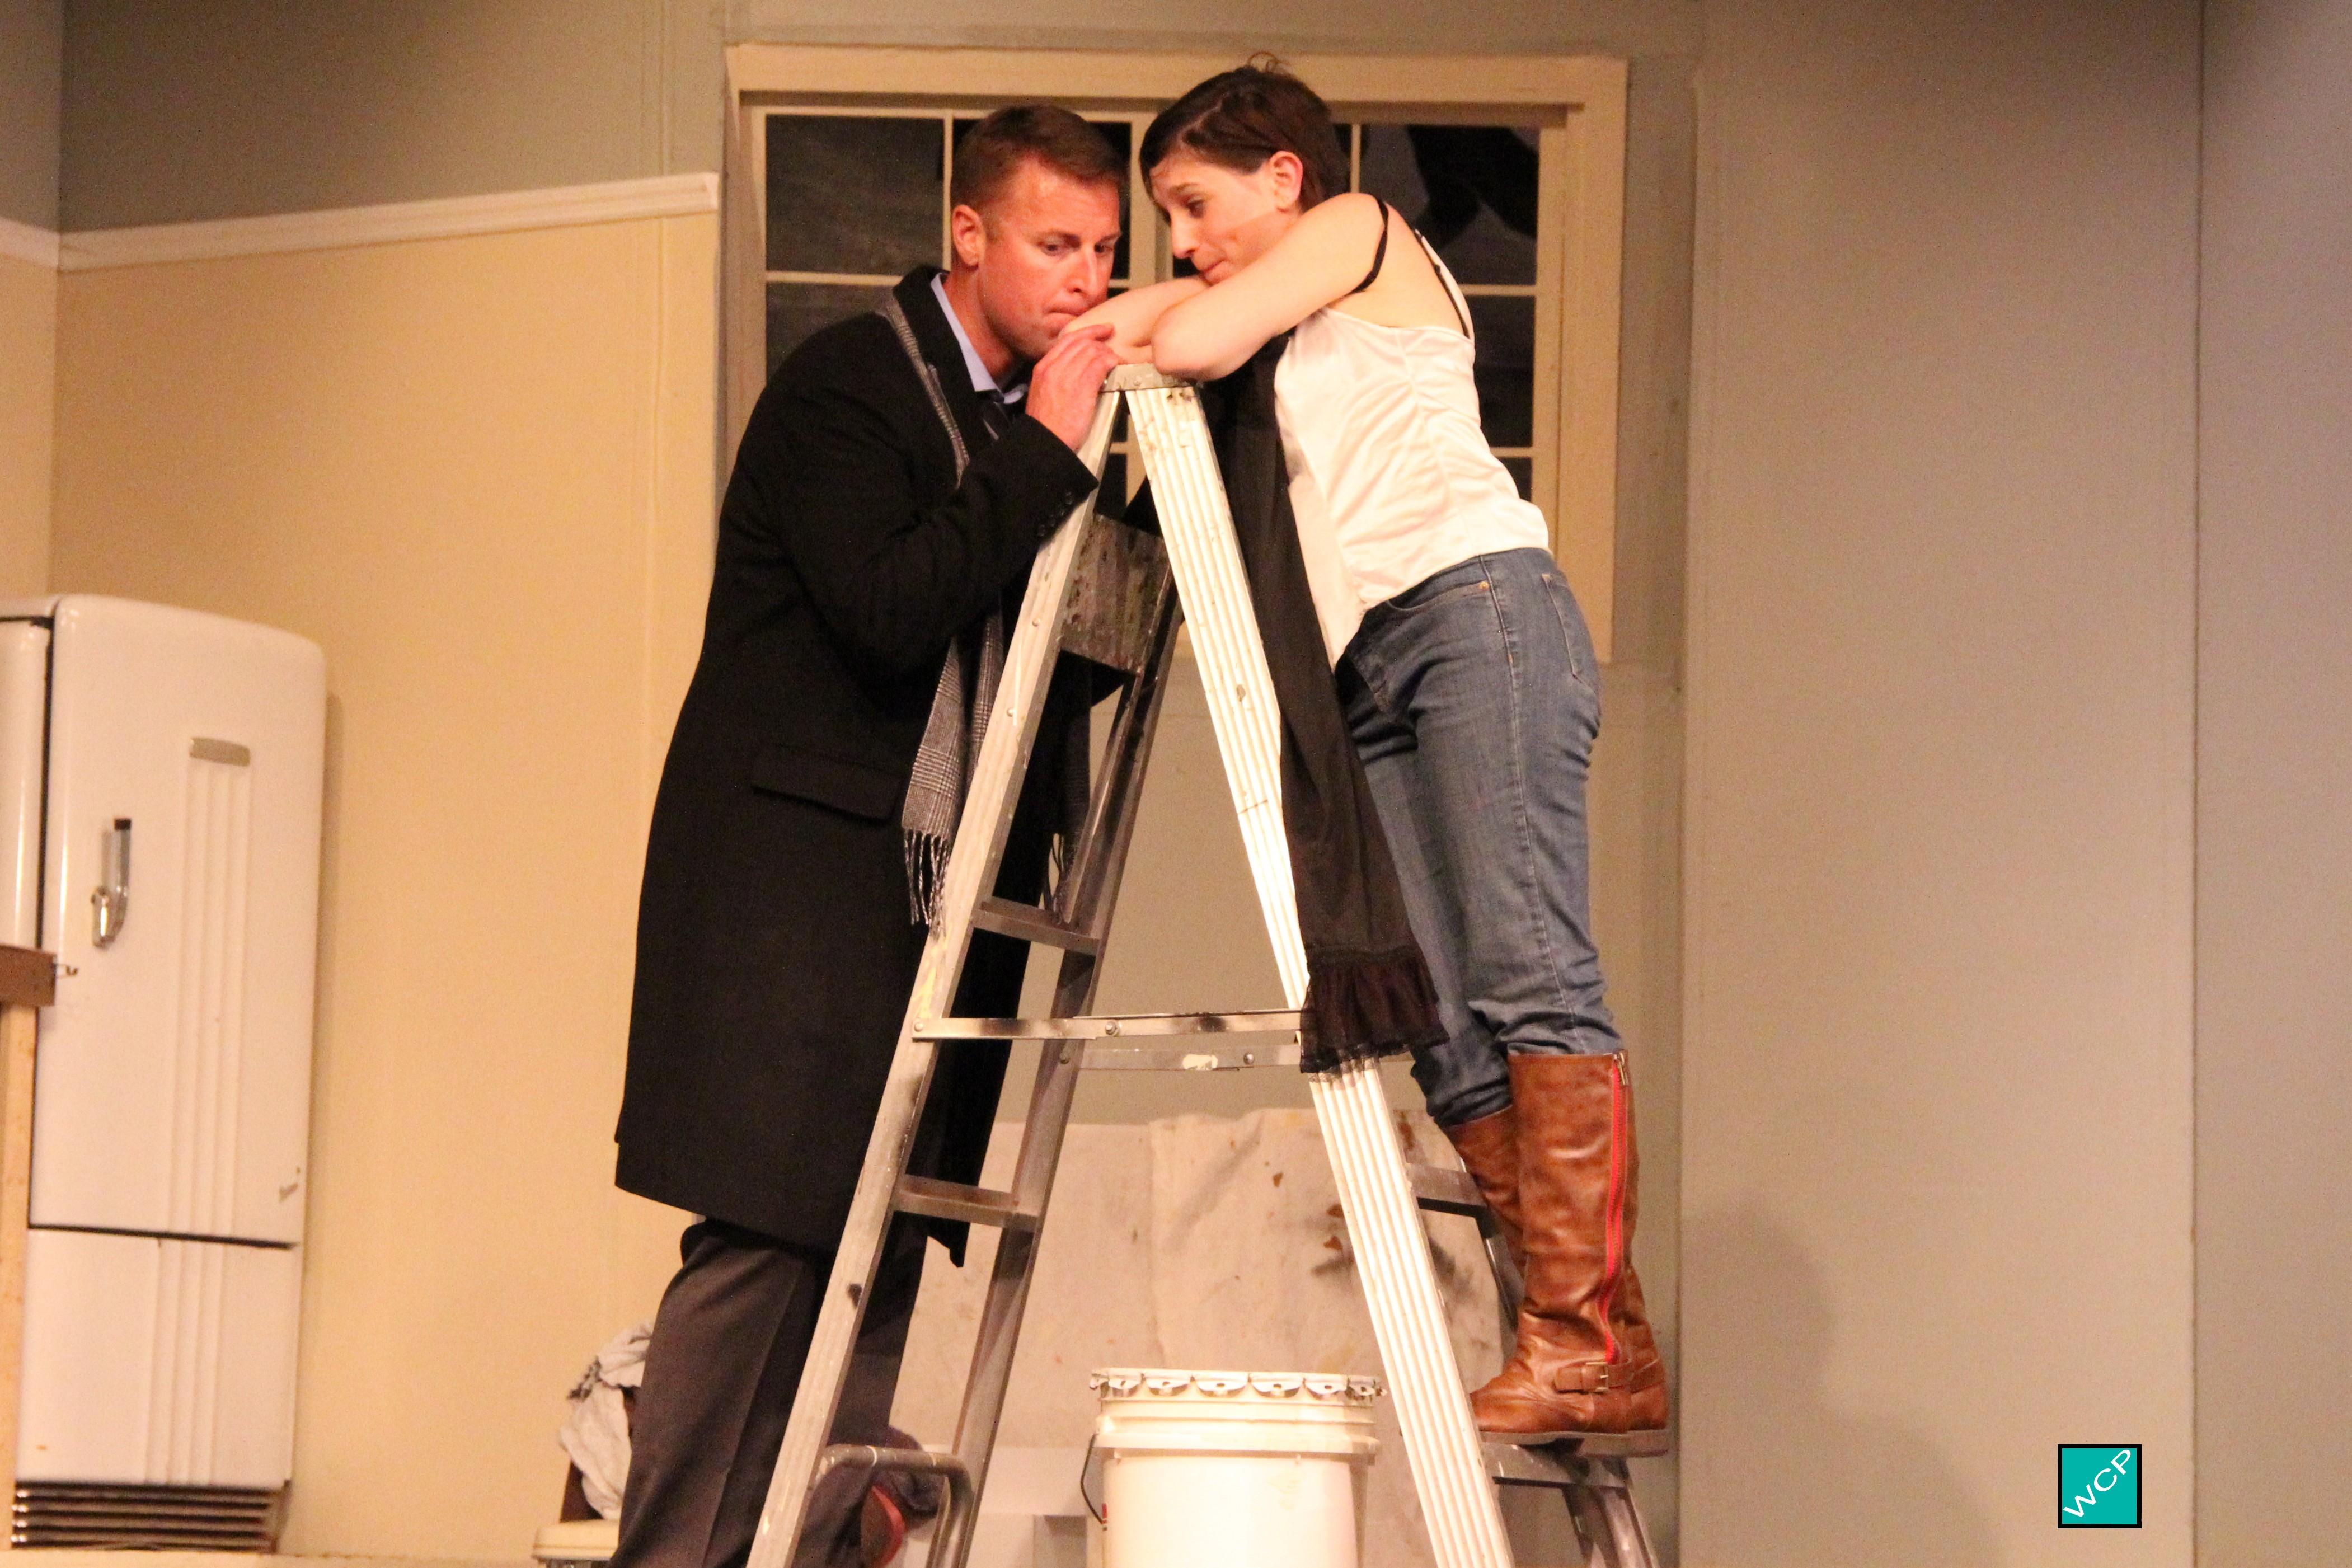 Brian Remo as Paul, Debbie Campanali as Corie